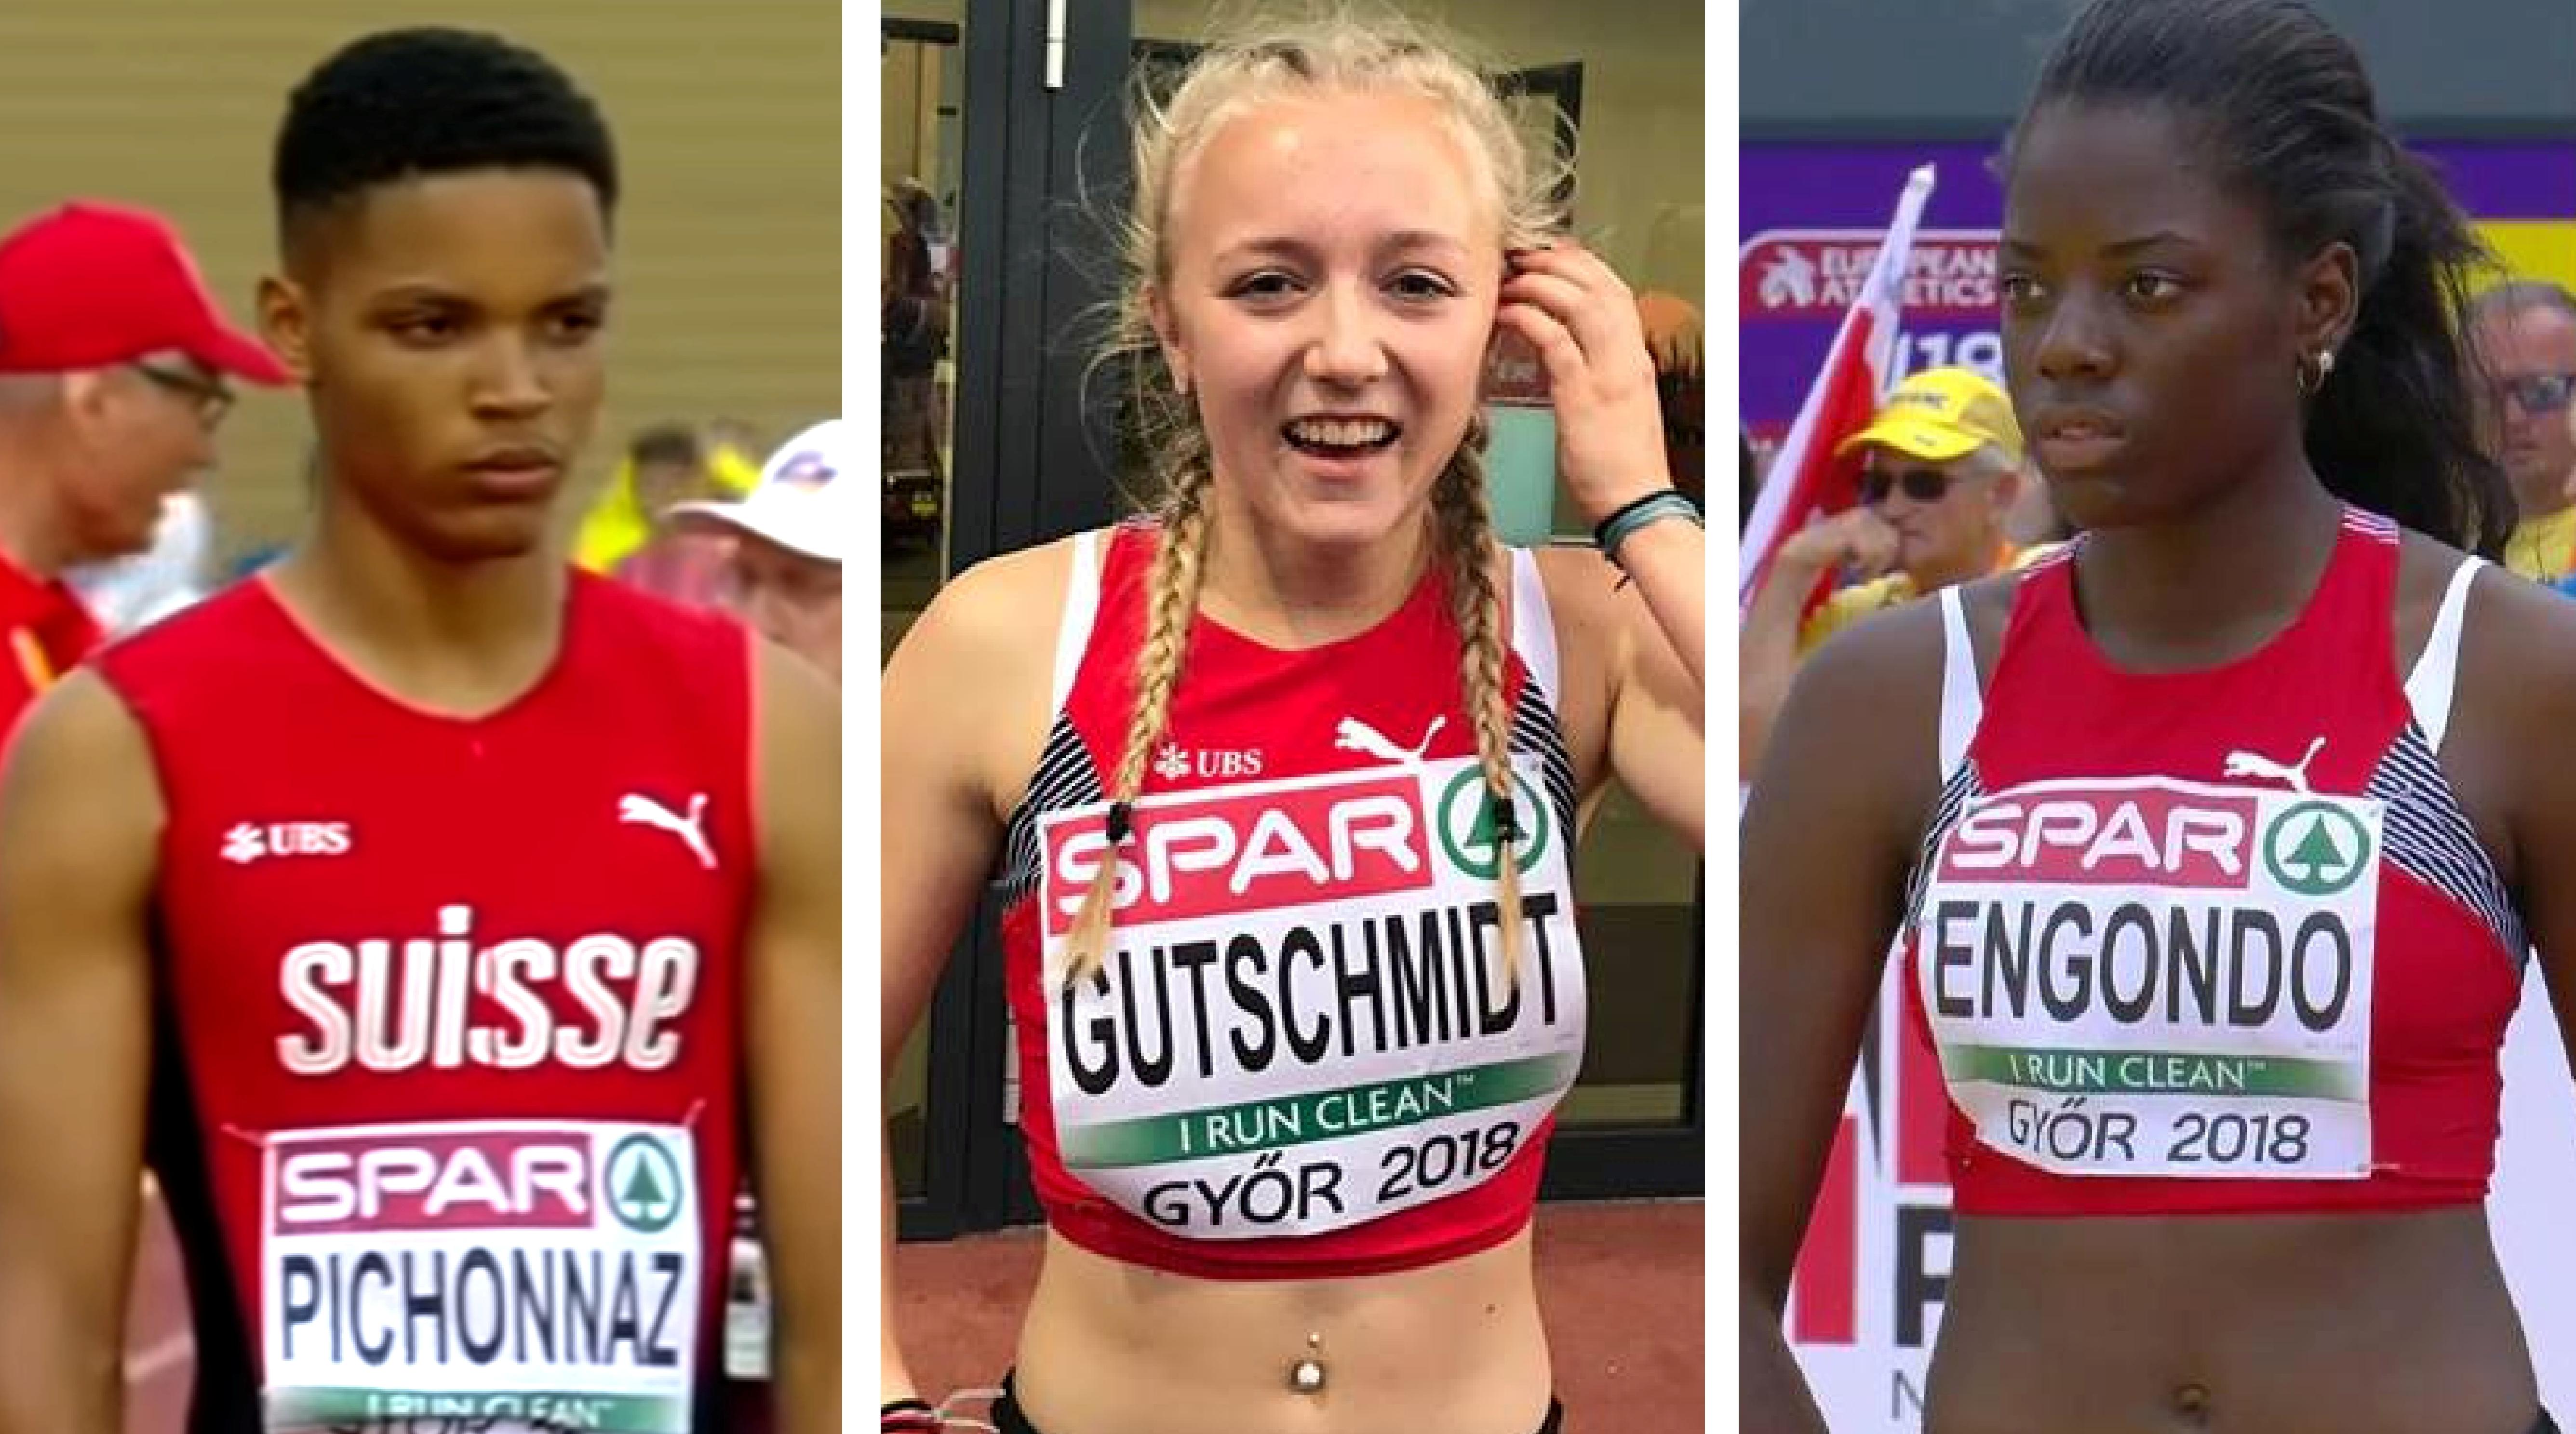 Championnats d'Europe U18 à Györ